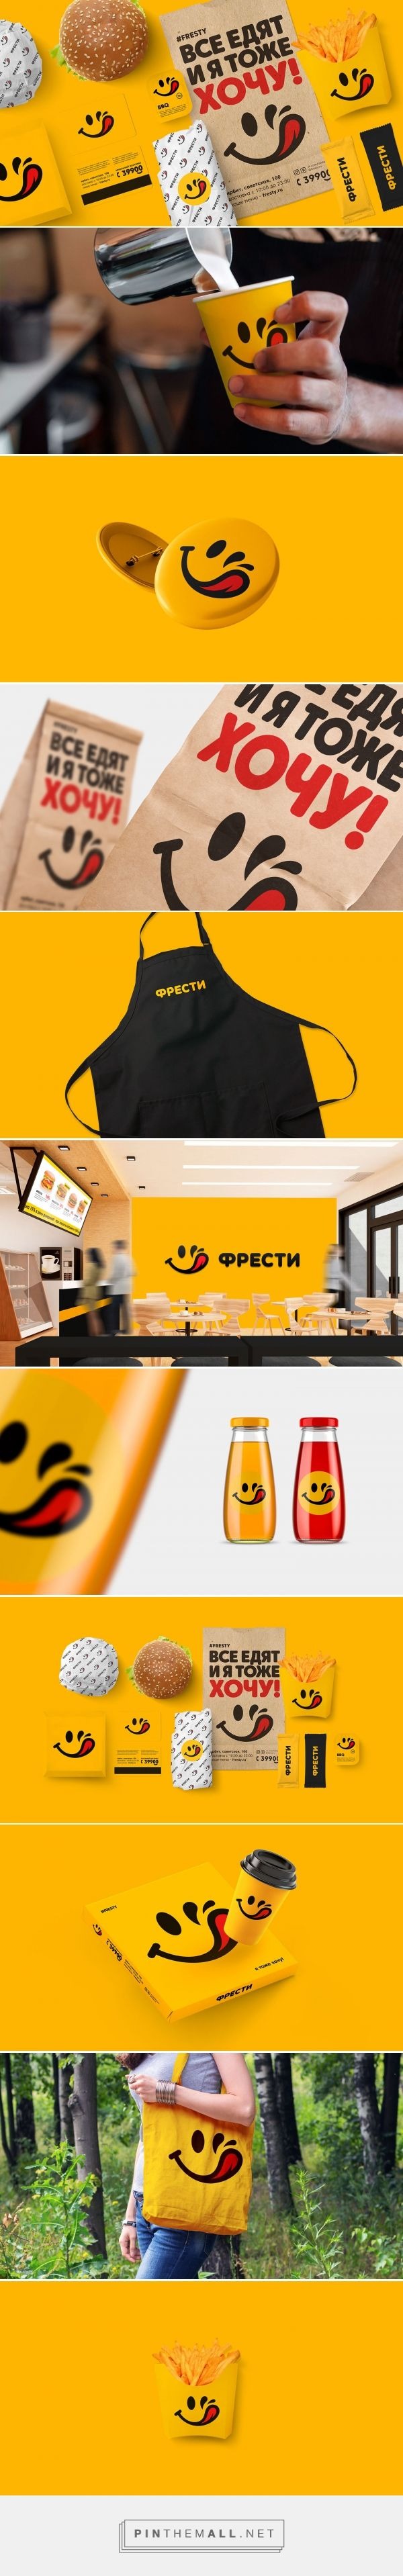 Fresty Fast Food Restaurant Branding by Konstantin Polyakov   Fivestar Branding Agency – Design and Branding Agency & Curated Inspiration Gallery